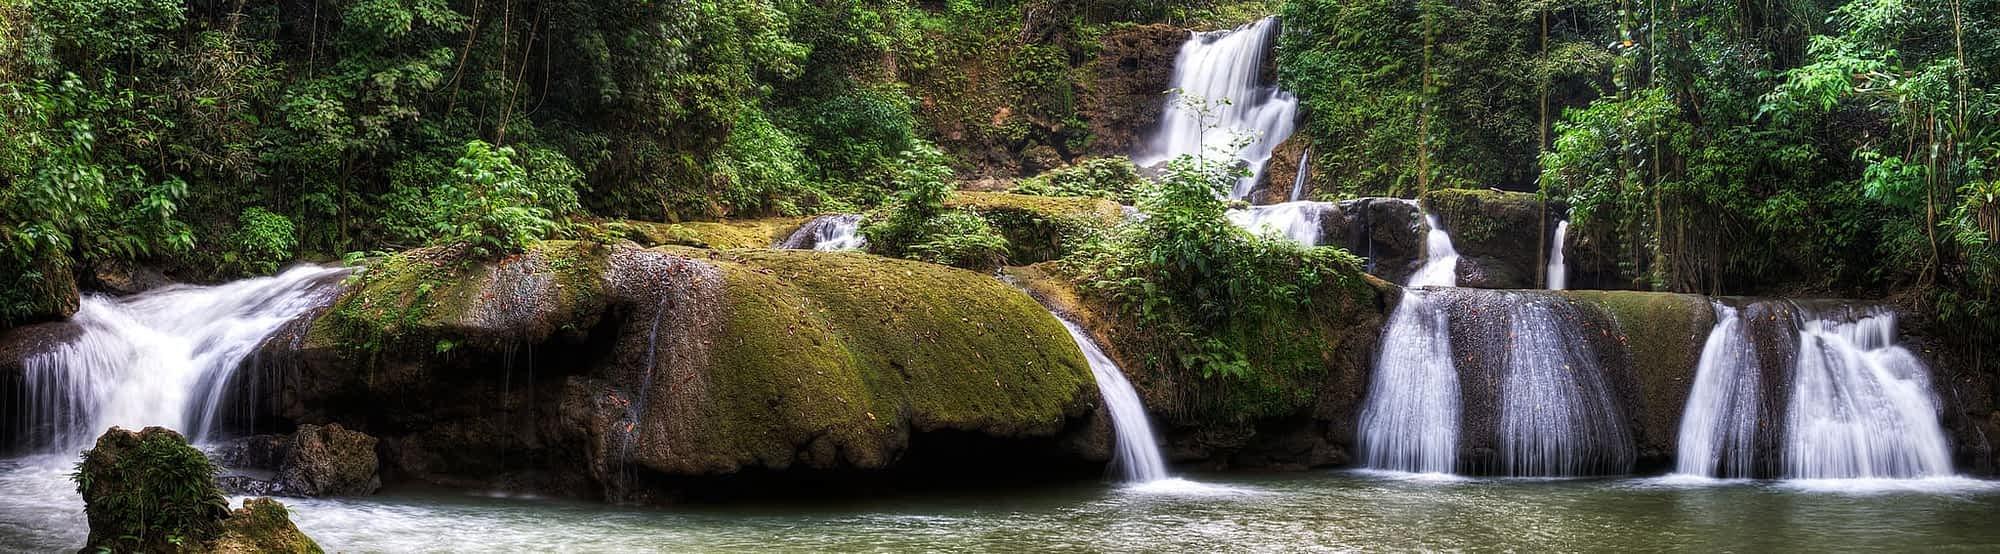 Travel Tips in Jamaica